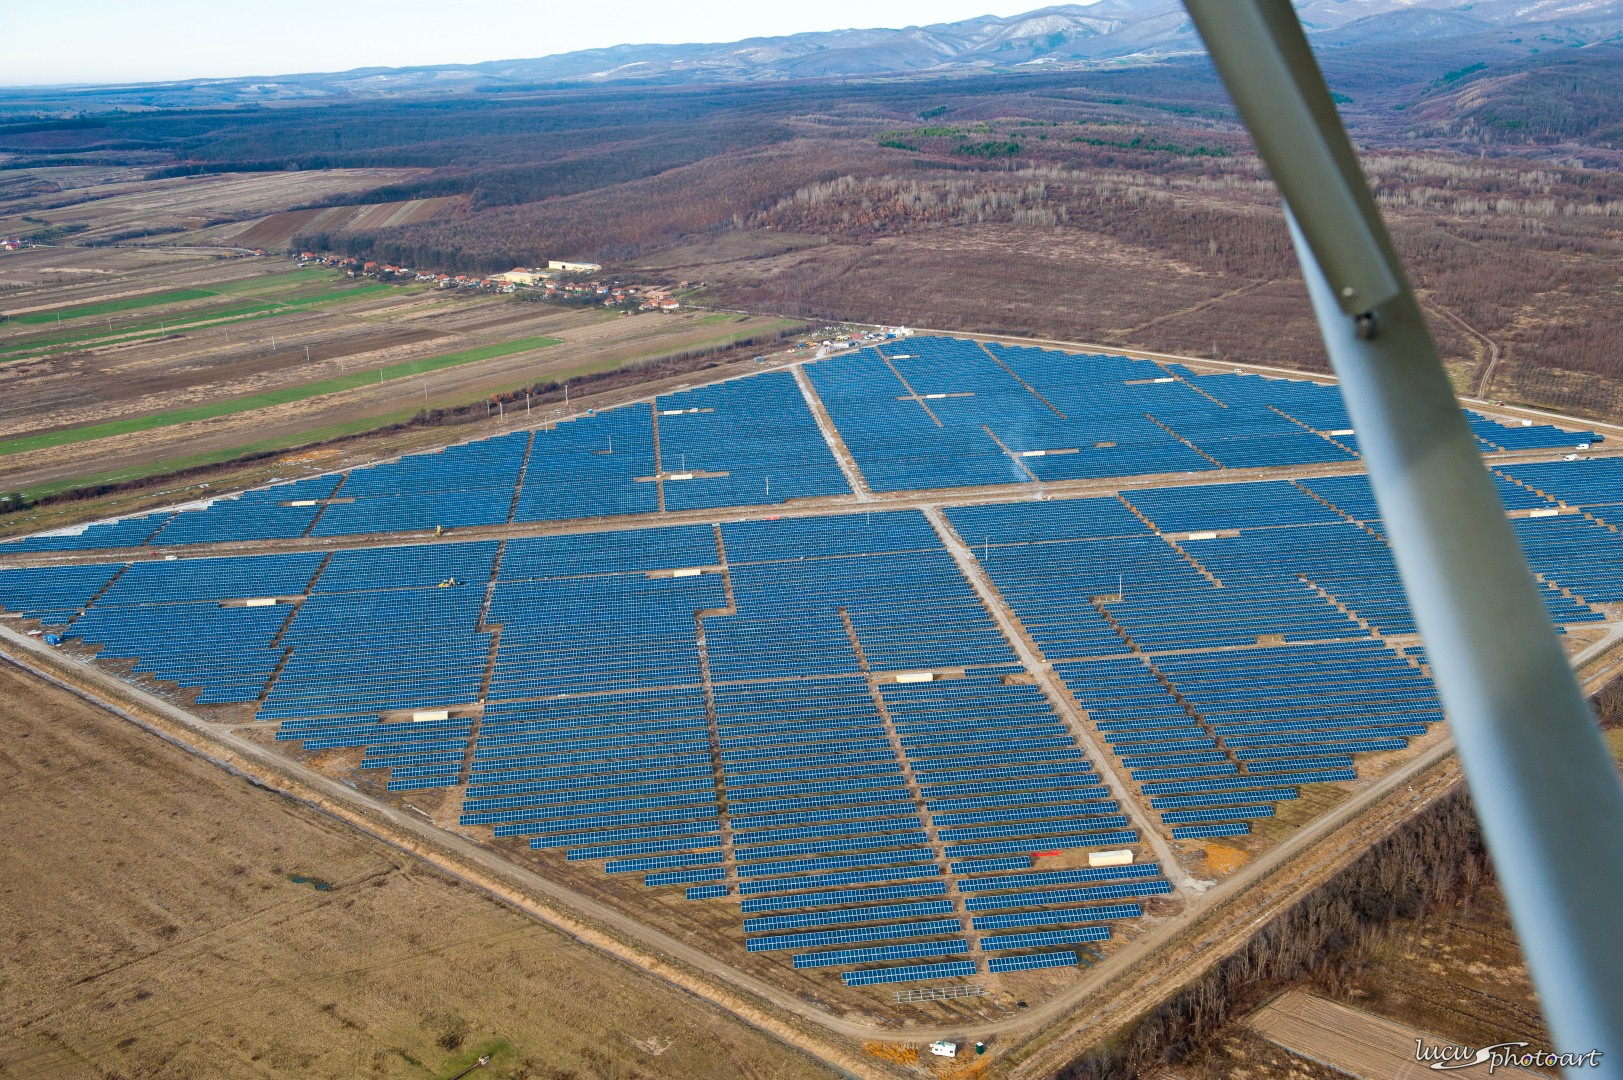 Sebis va avea cel mai mare parc fotovoltaic din Romania. Investitie cat 28 de insule in Grecia